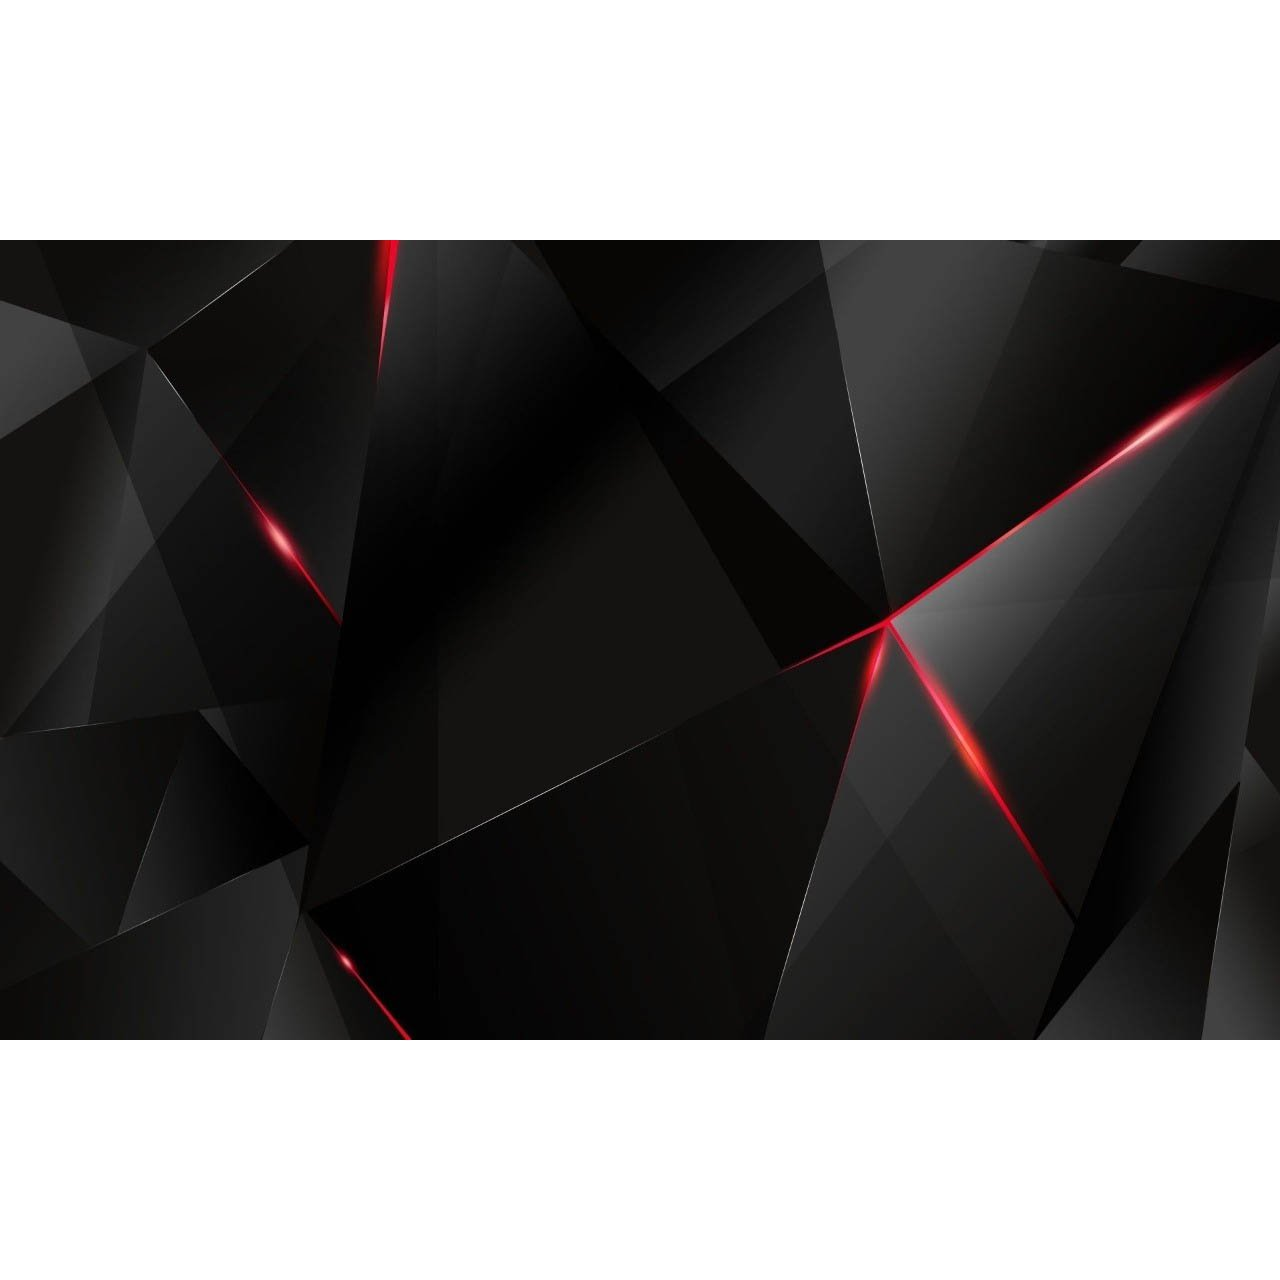 mouse pad colors 50818 2000 202594 4